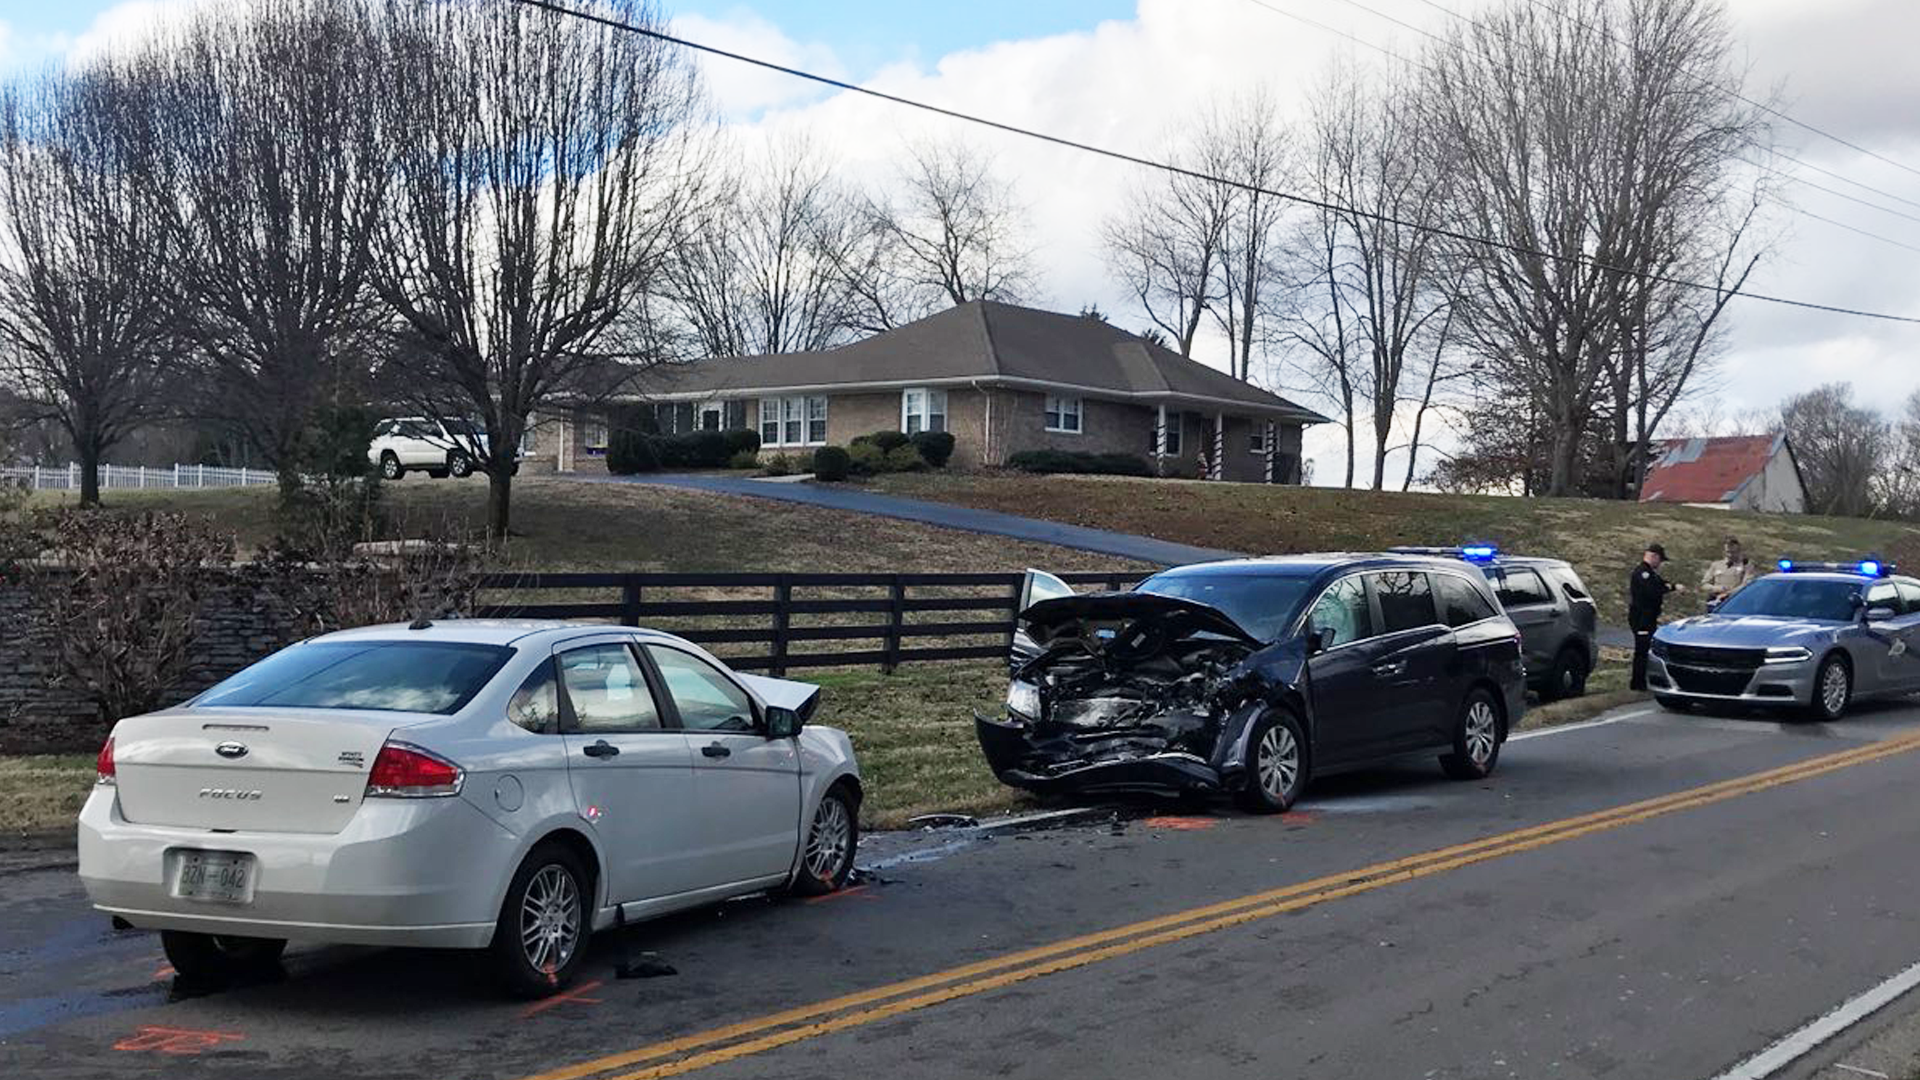 Honda Bowling Green Ky >> Three children hospitalized after vehicle crash in Warren